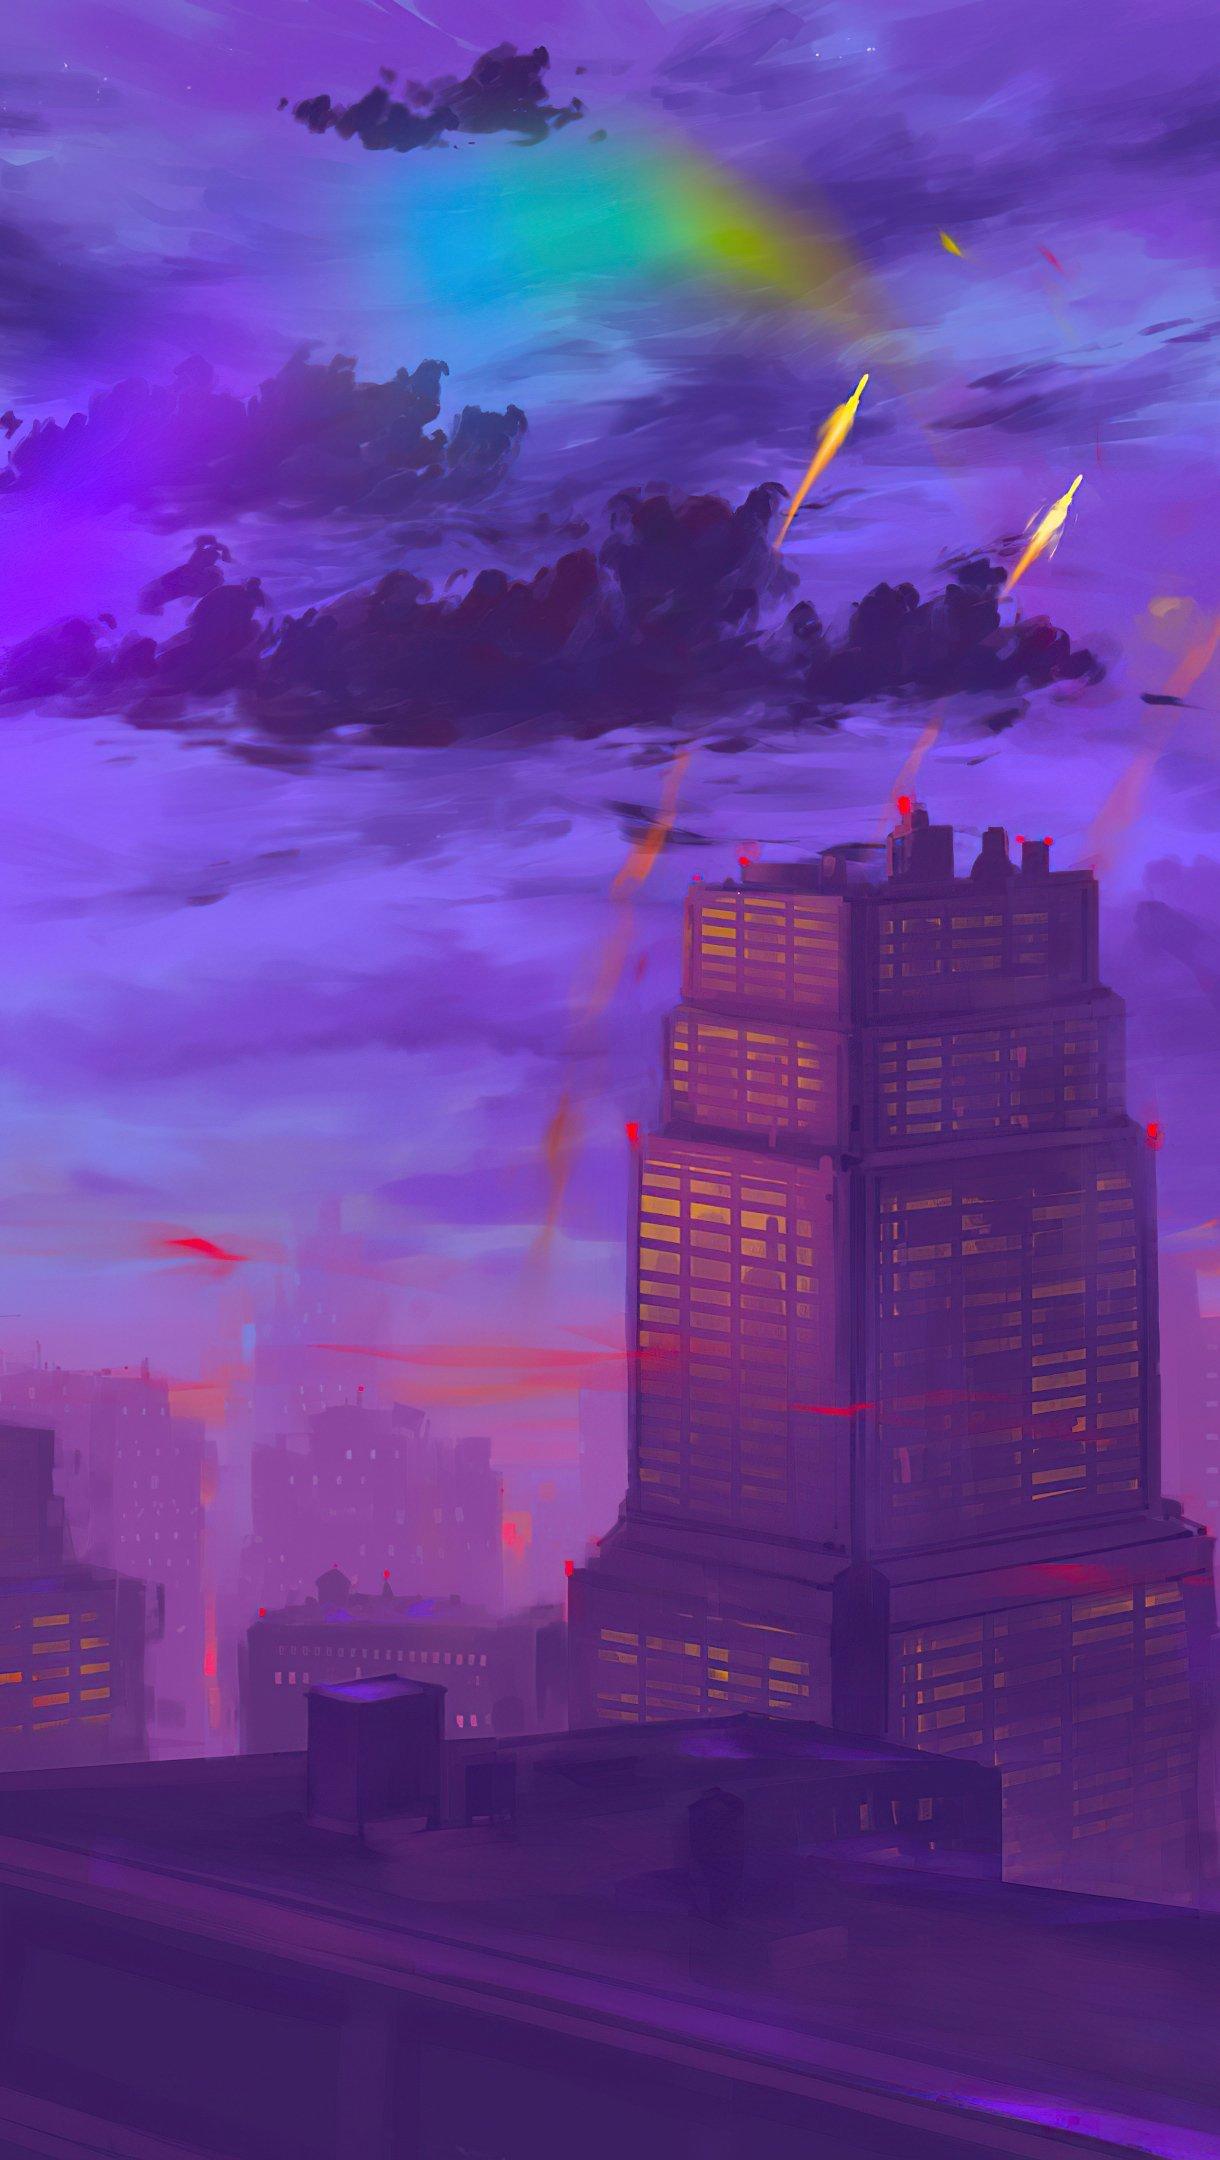 Wallpaper Sunset in the city Illustration Vertical